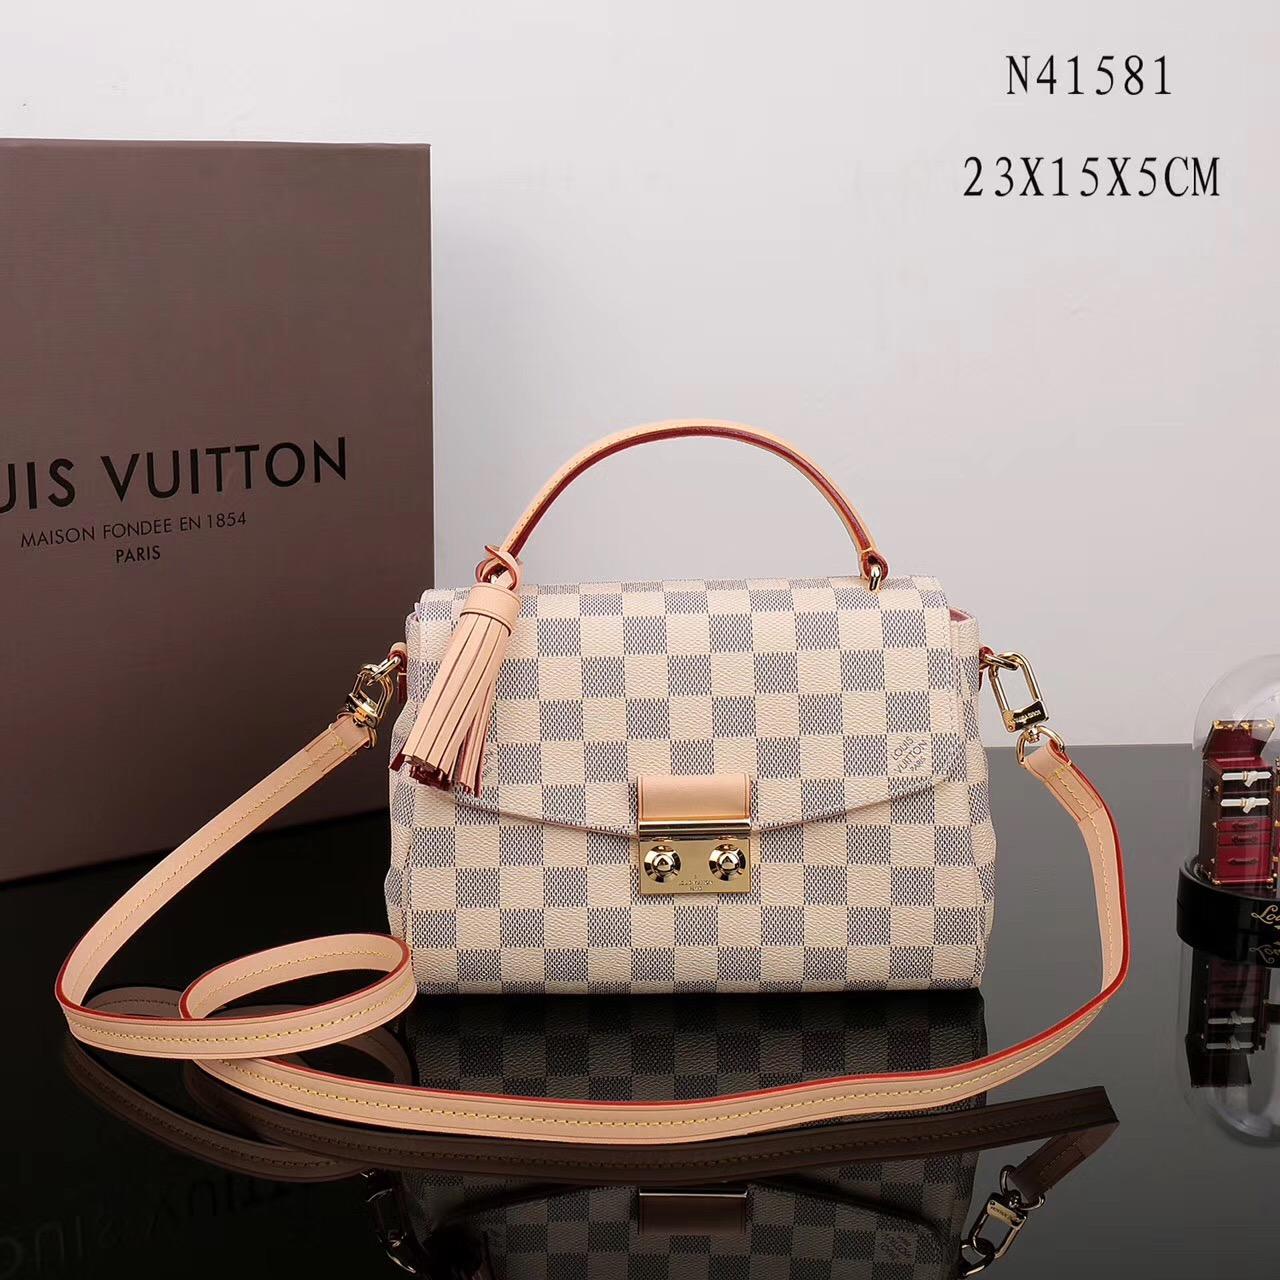 d18863900692 The Best Louis Vuitton Original Quality Replica Handbags Online Store